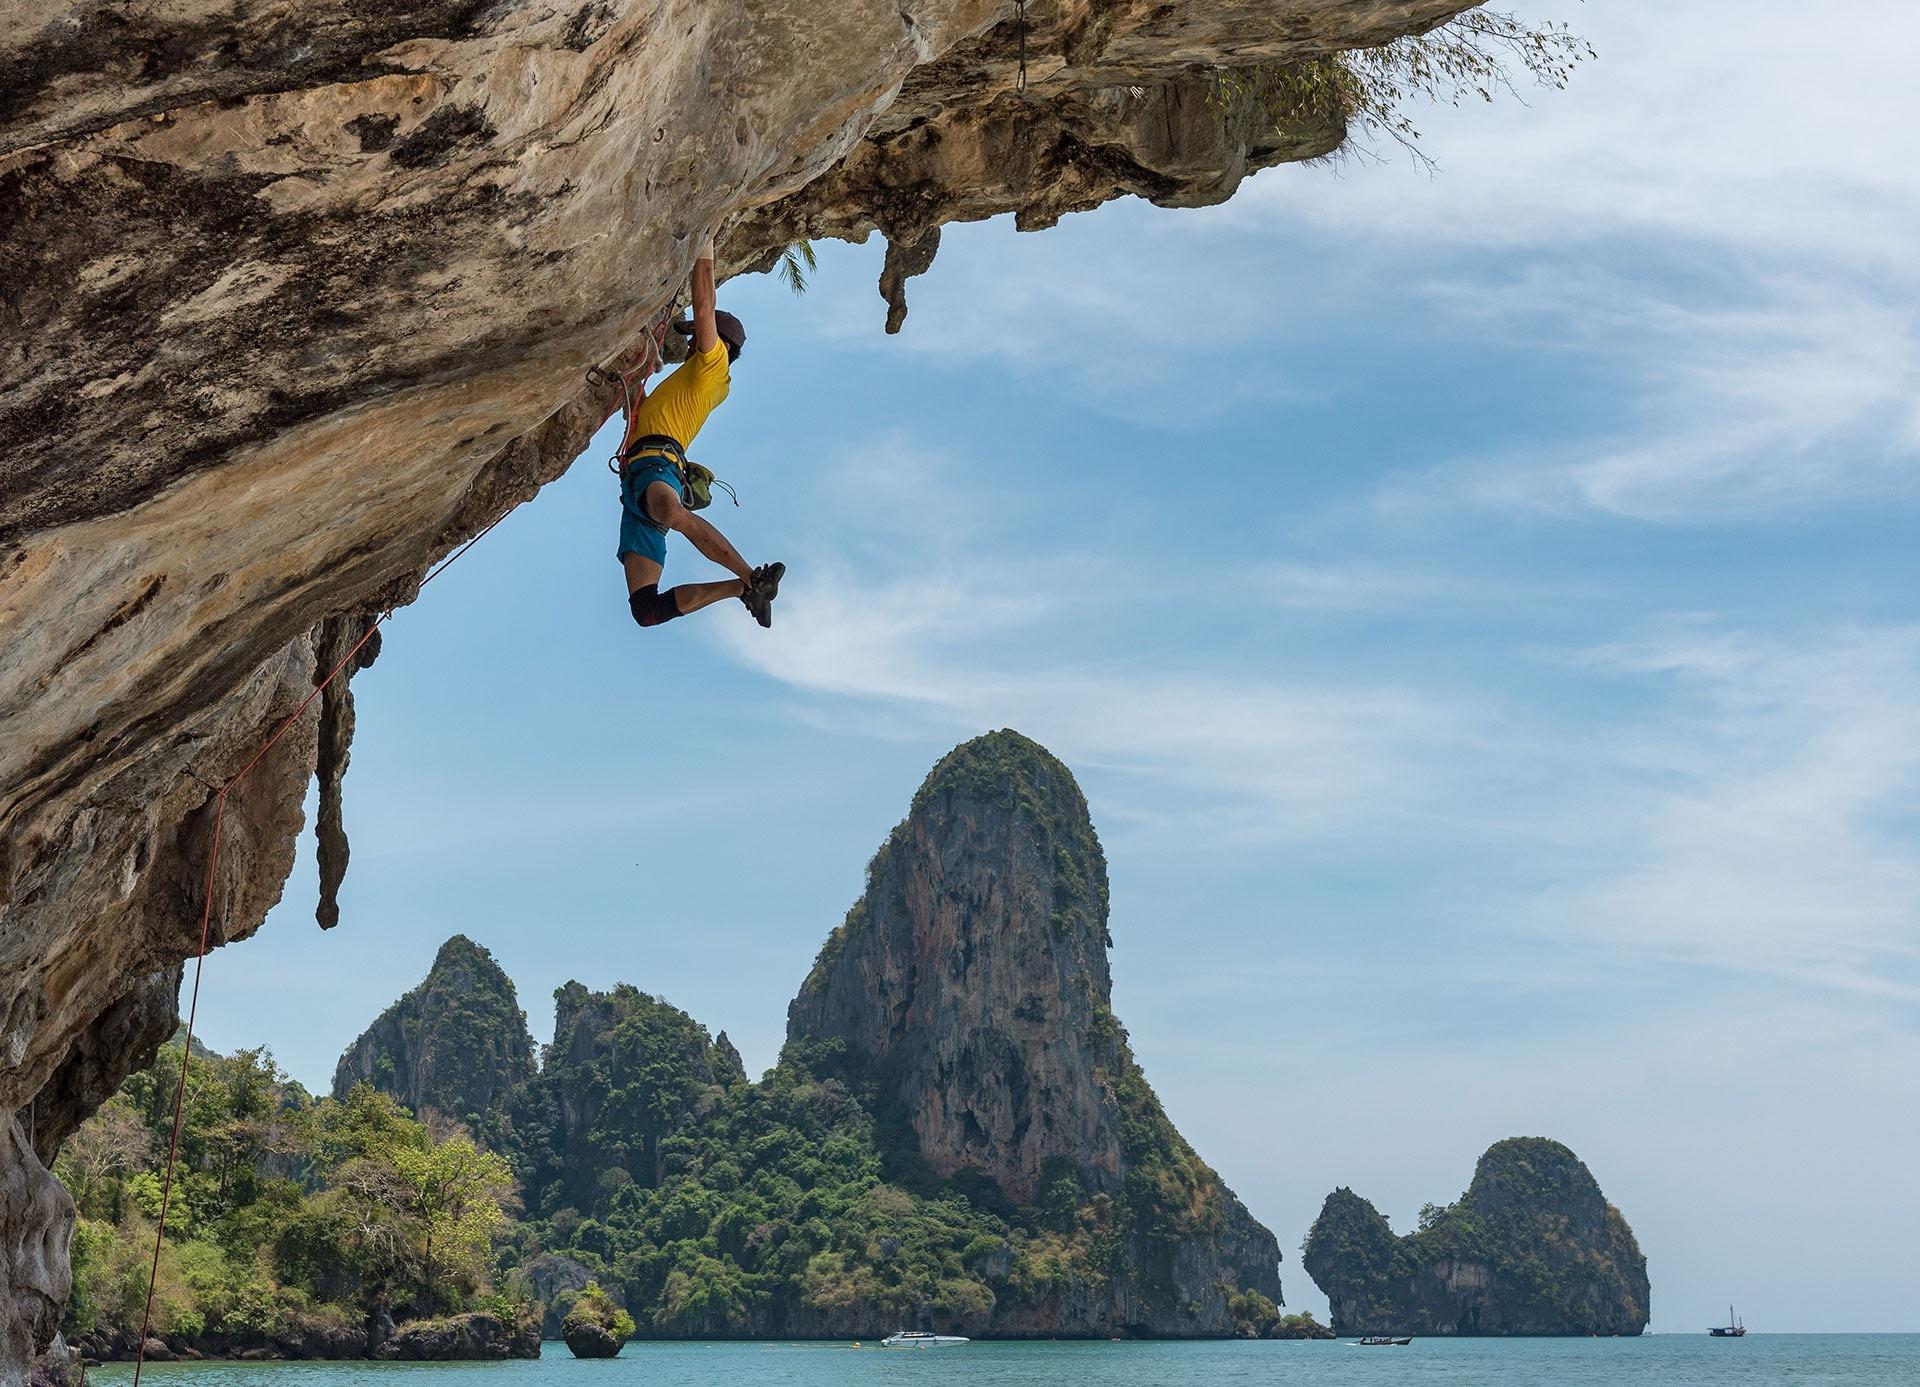 Man using motivation habits to help overcome rock climbing